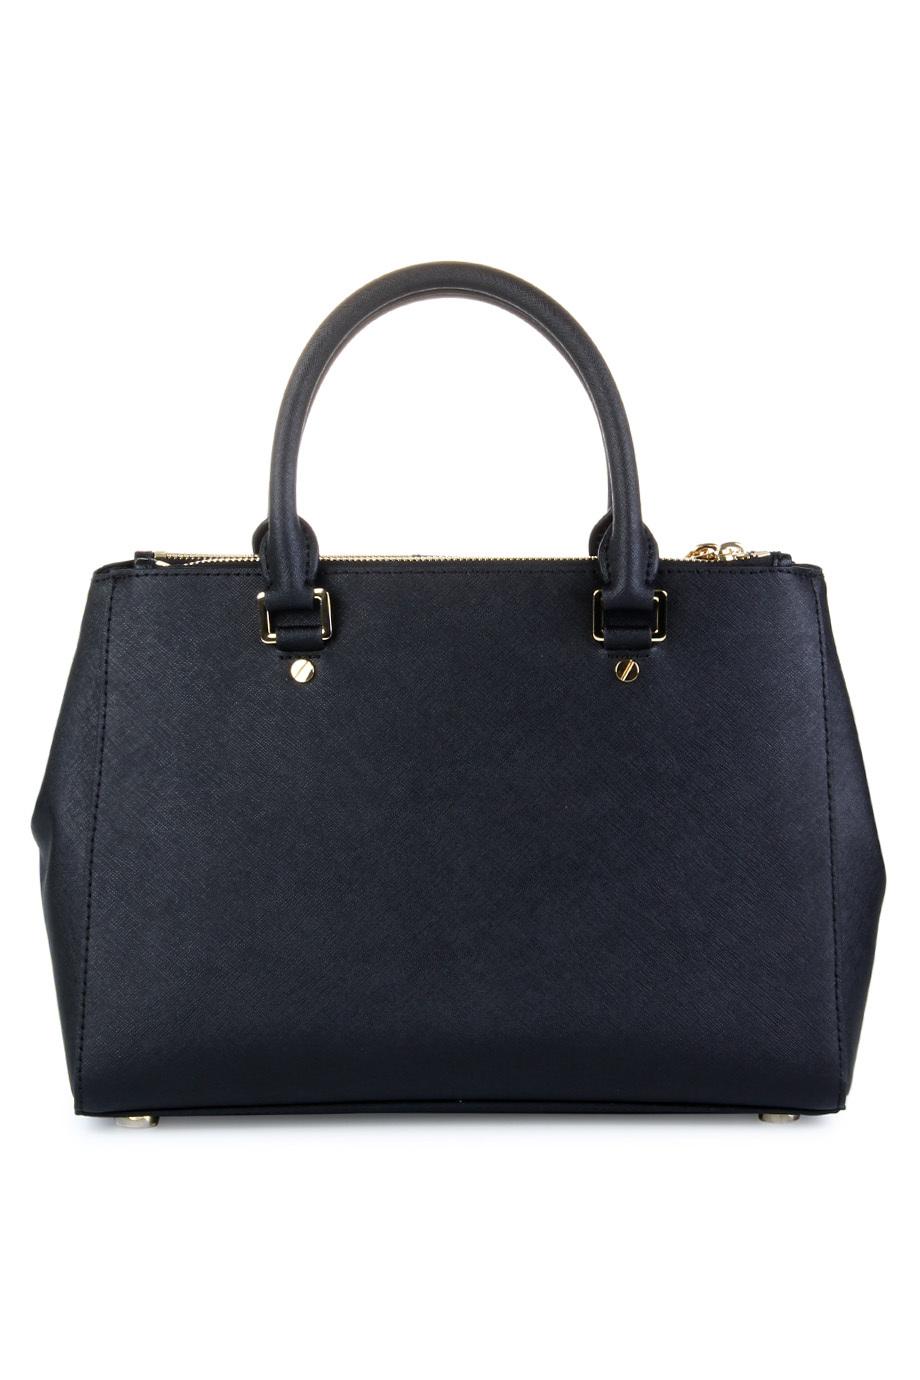 9f9540e23022e4 New 2015 free shipping Famous Sutton/hamilton designer handbags brand  luxury women messenger lock leather